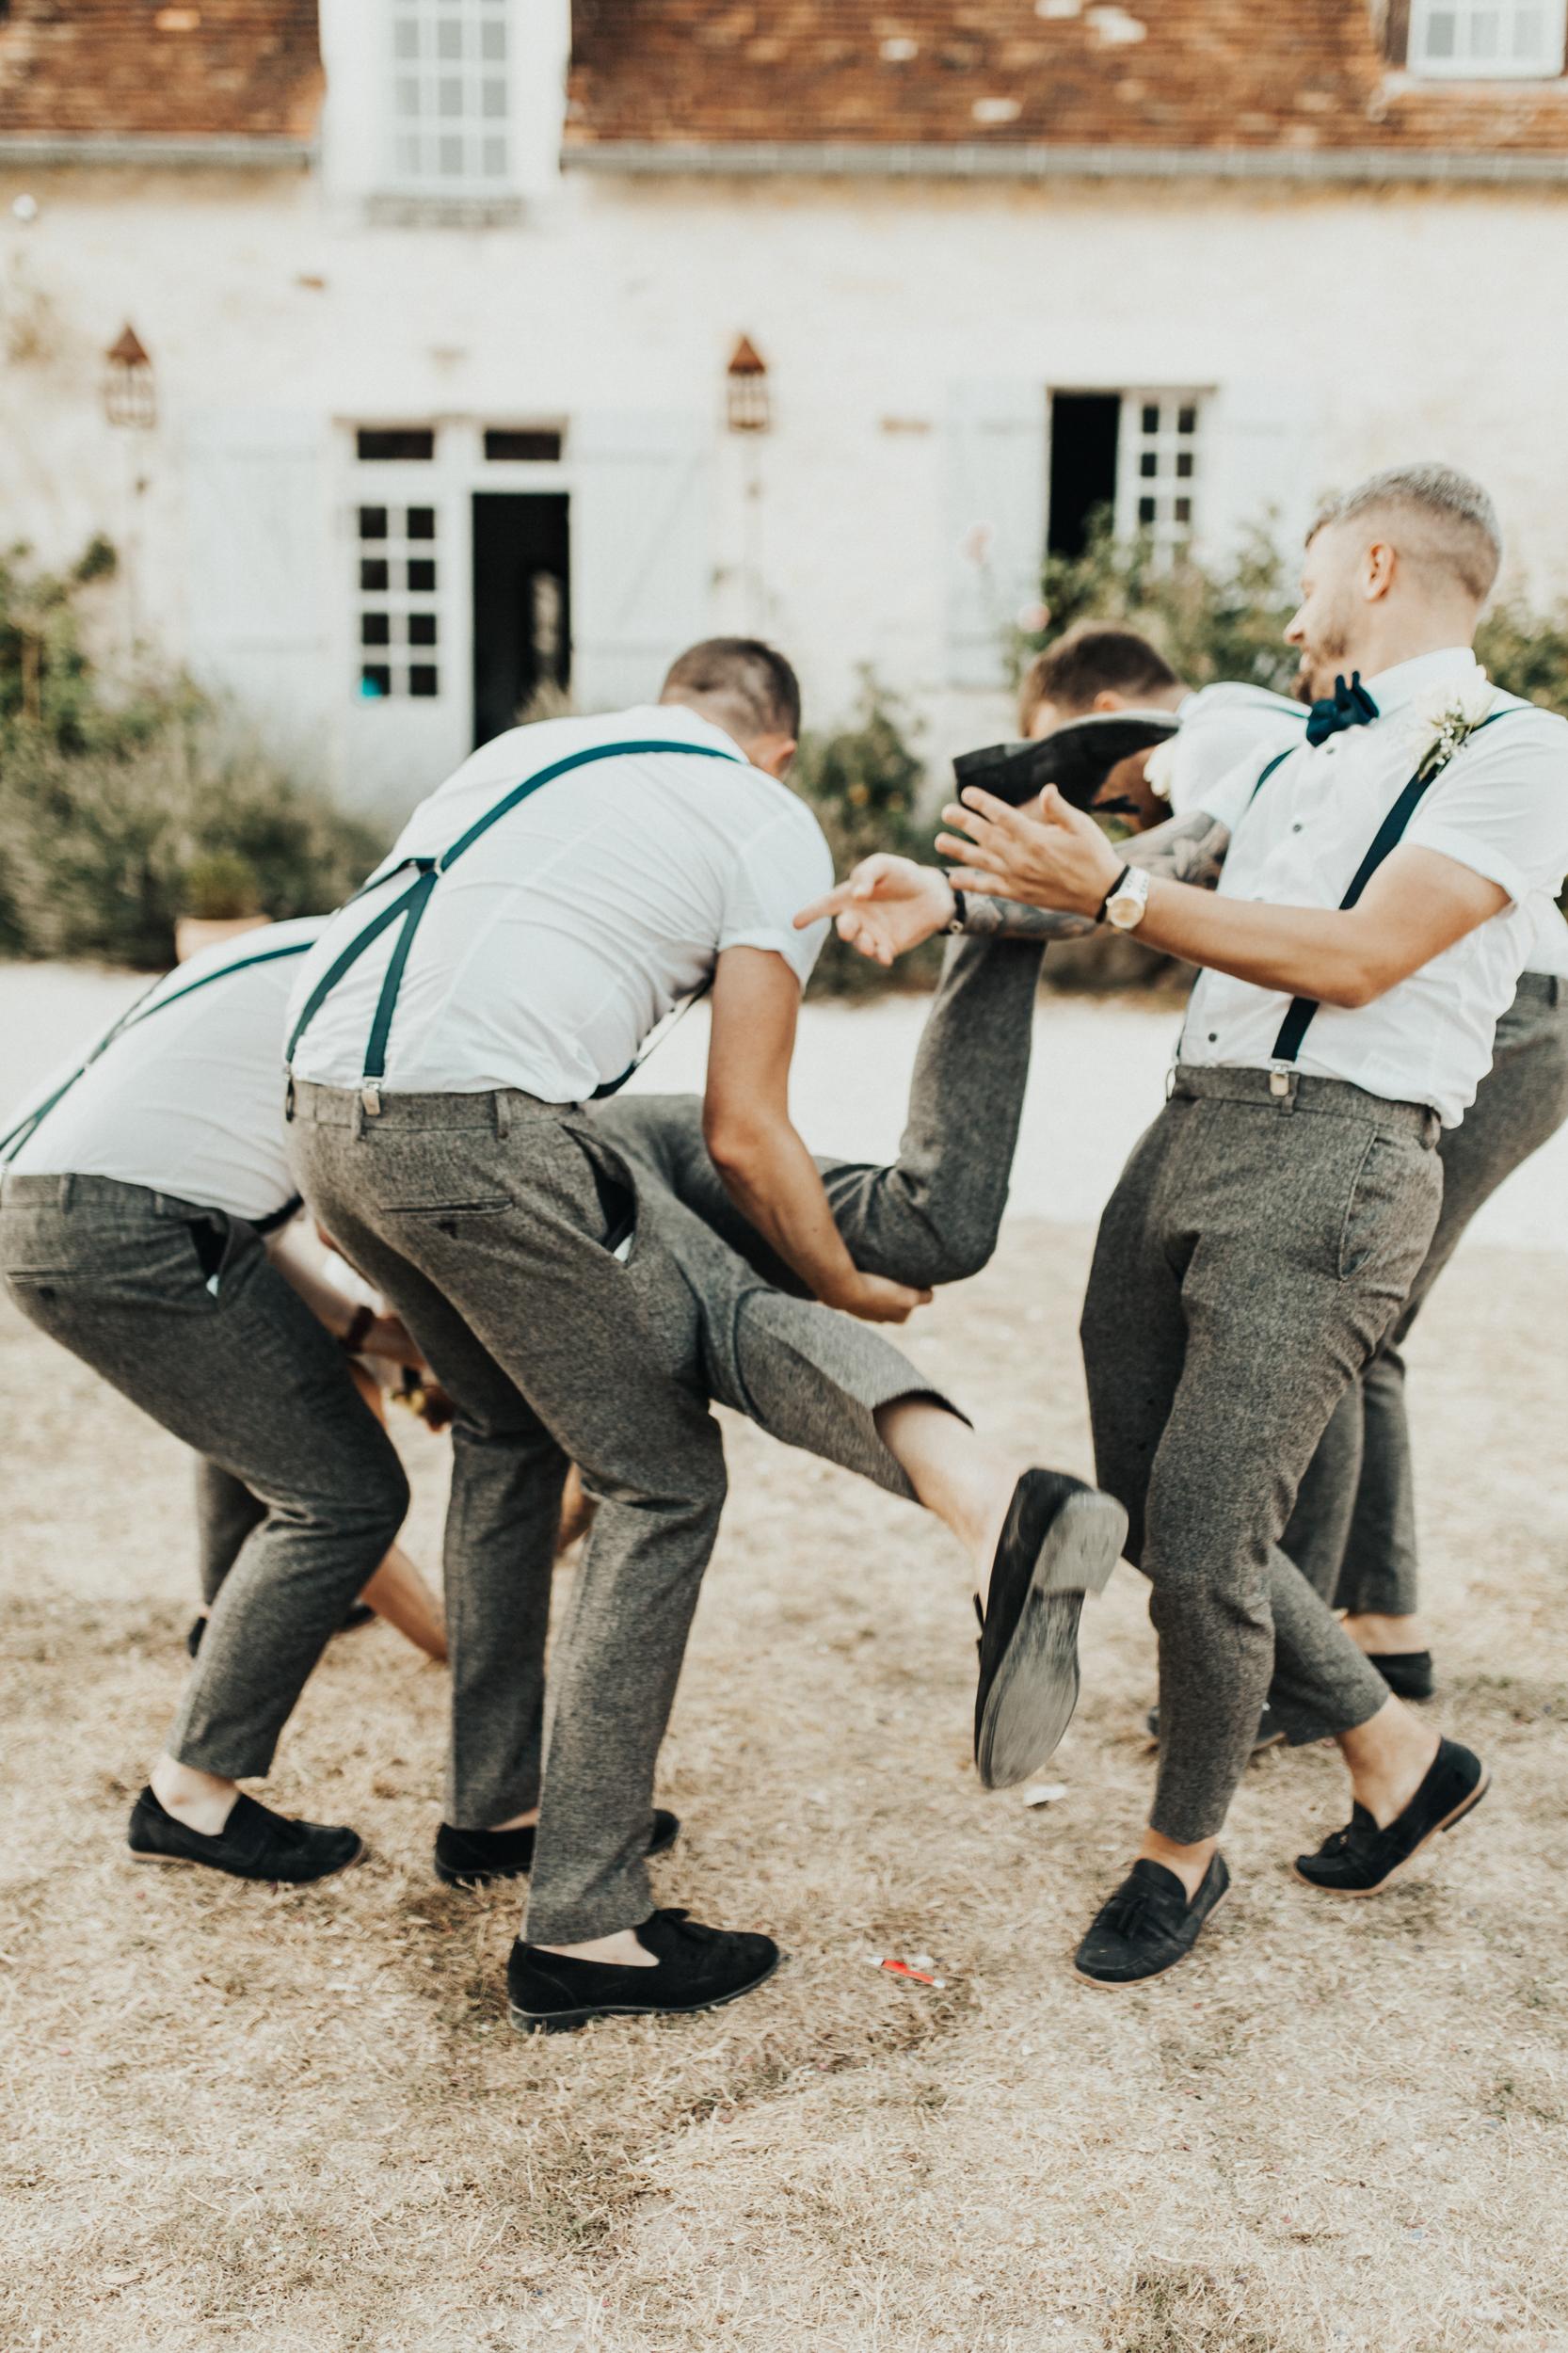 Amy-Zac-Destination-Wedding-France-Manoir-Foulquetiere-Darina-Stoda-Photography-79.jpg